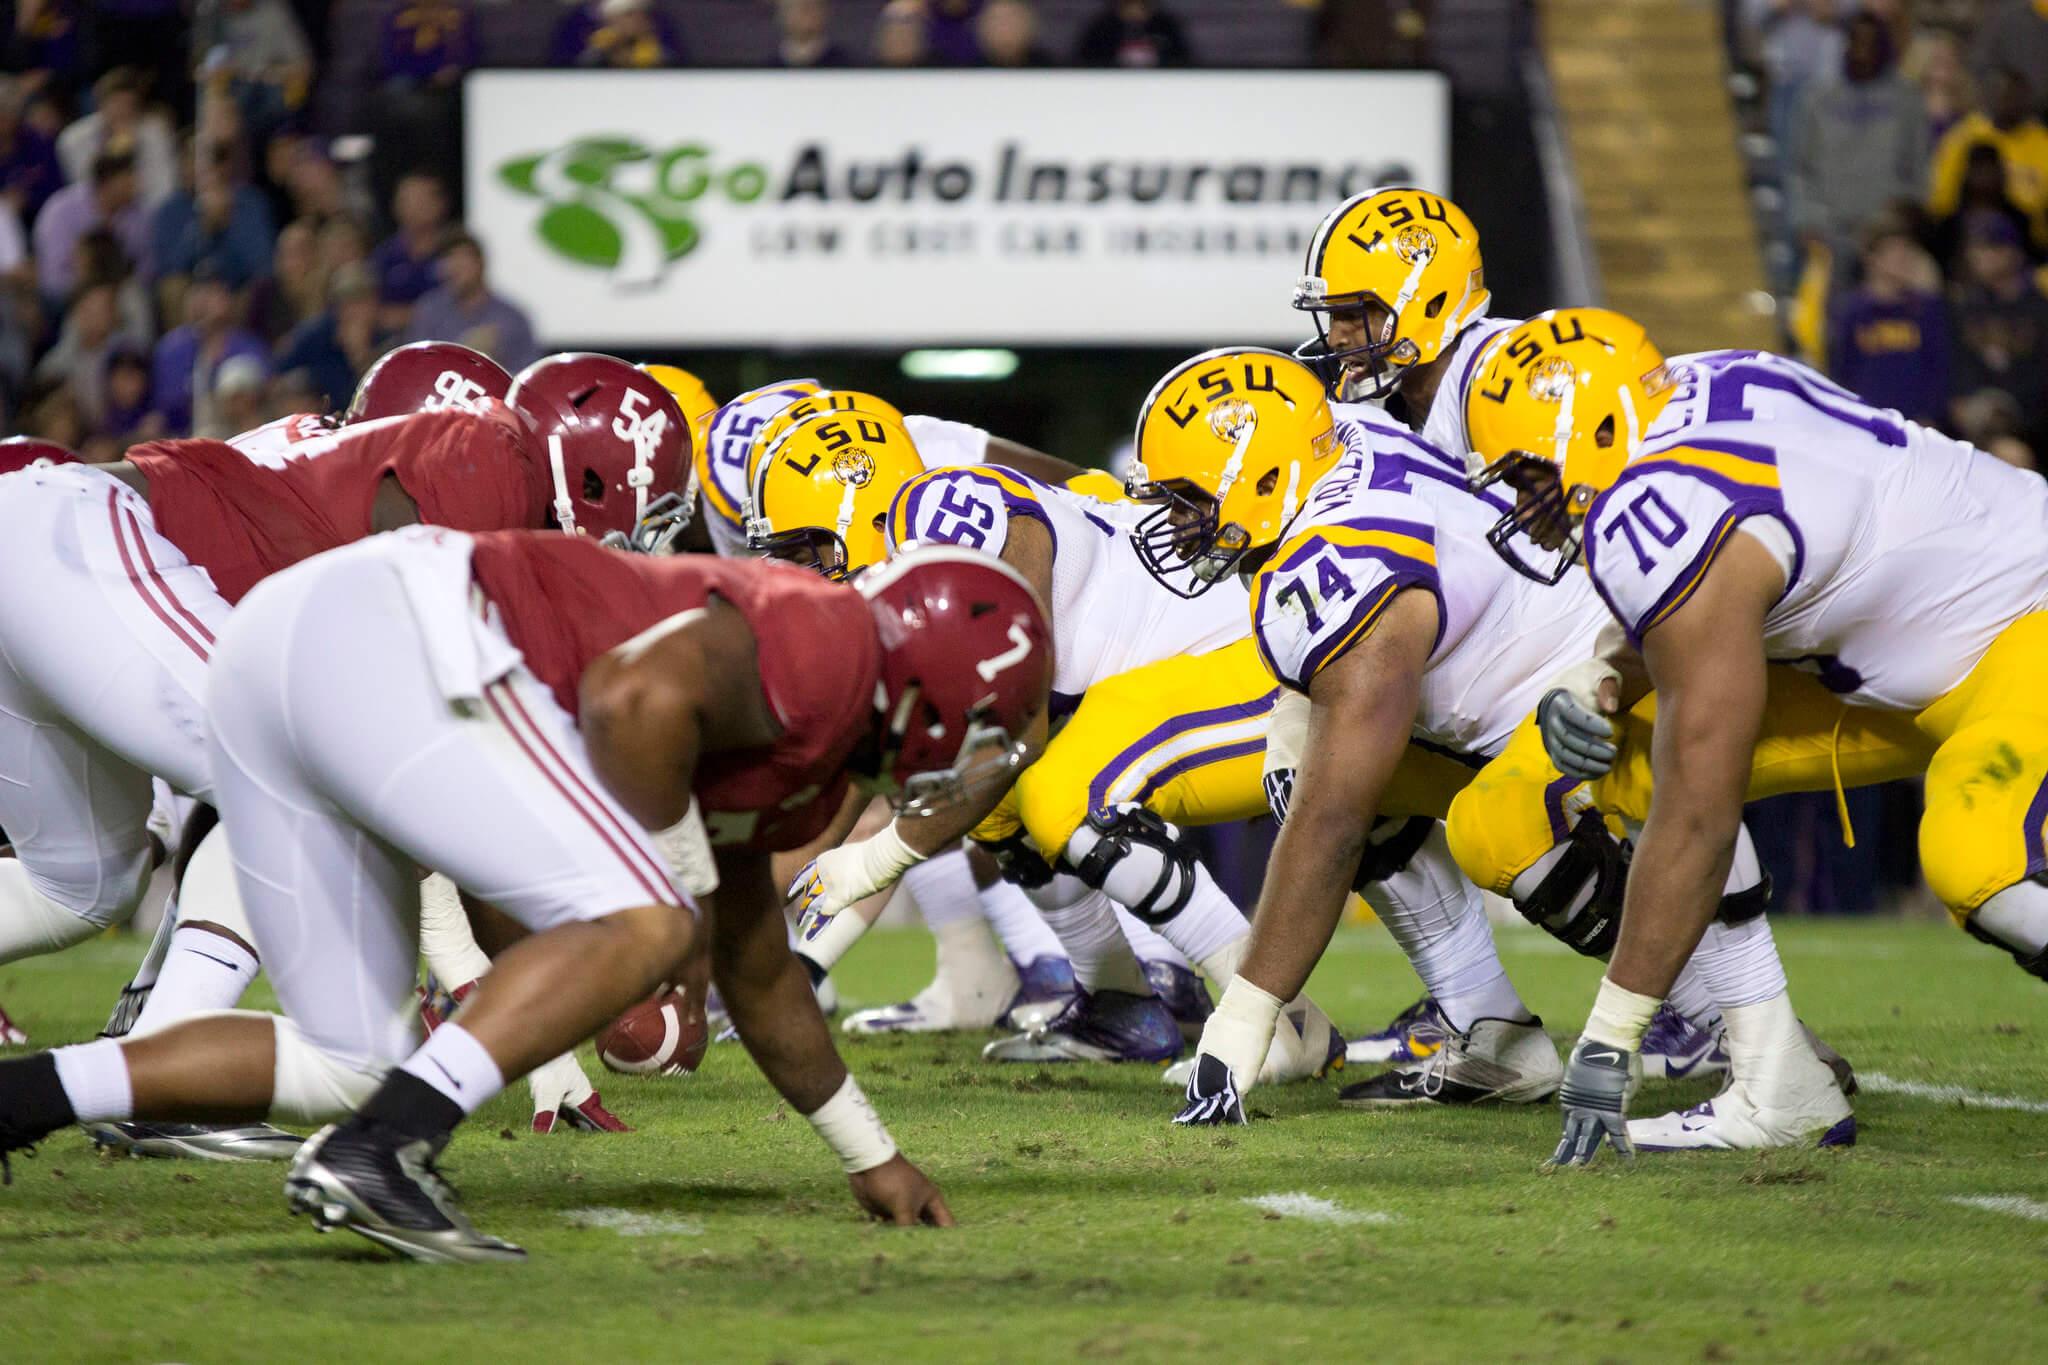 LSU vs Alabama rivalry